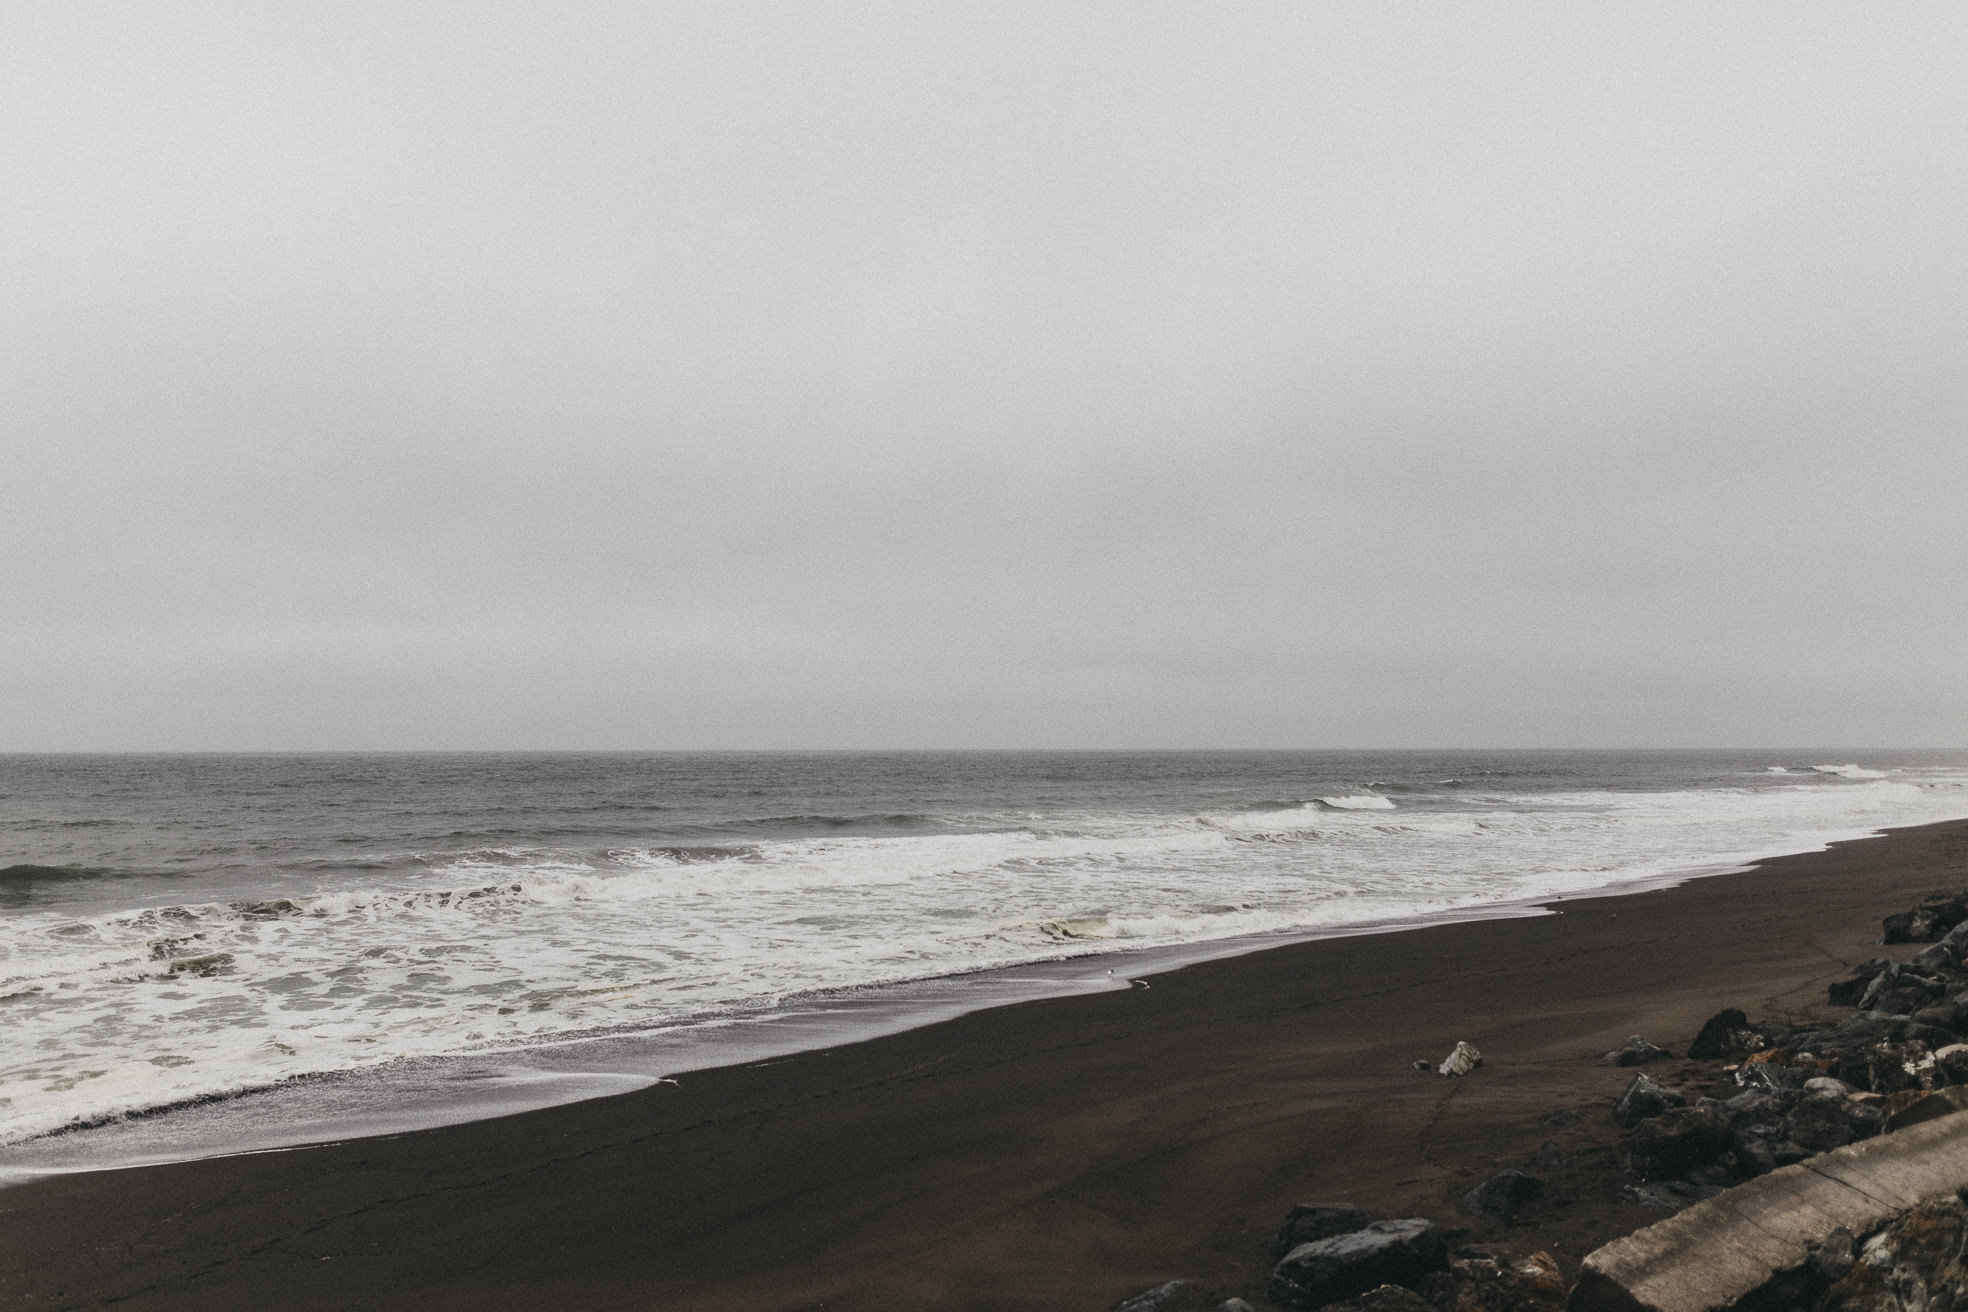 San-Francisco-BildervomLeben-9813